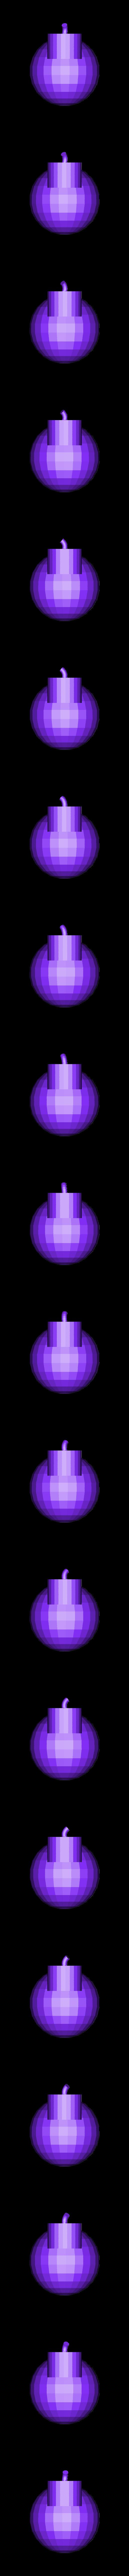 Bombs.stl Download free OBJ file Zelda Bombs • 3D printing design, Hoofbaugh